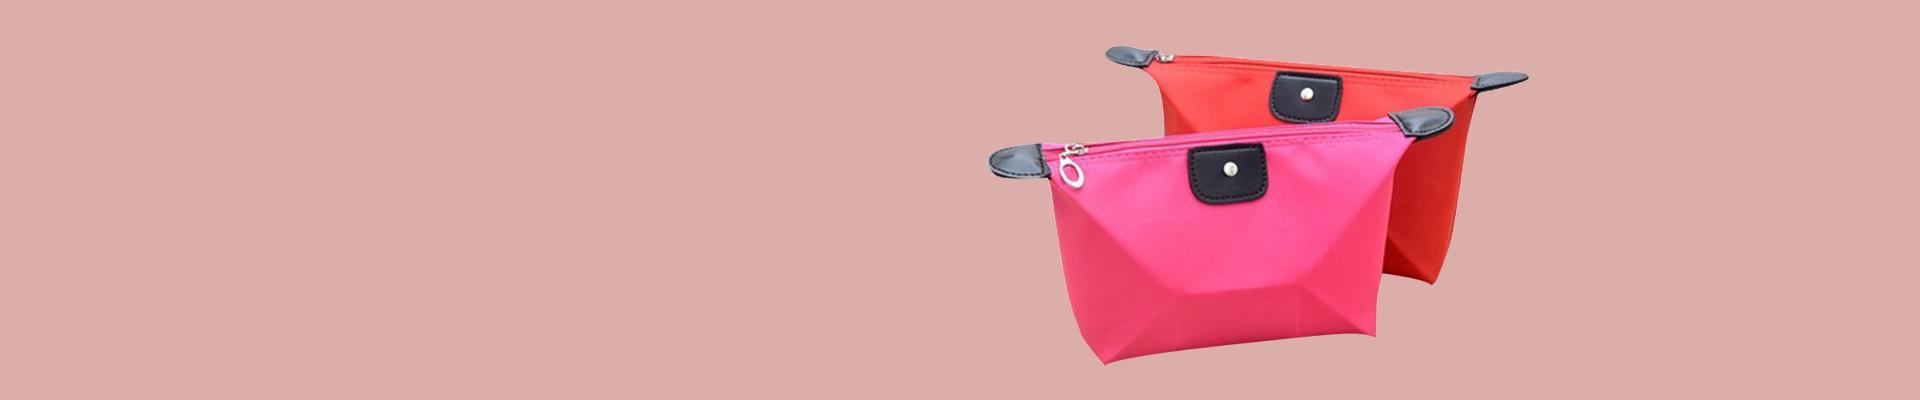 Jual Tas Kosmetik - Makeup Bag & Pouch Online